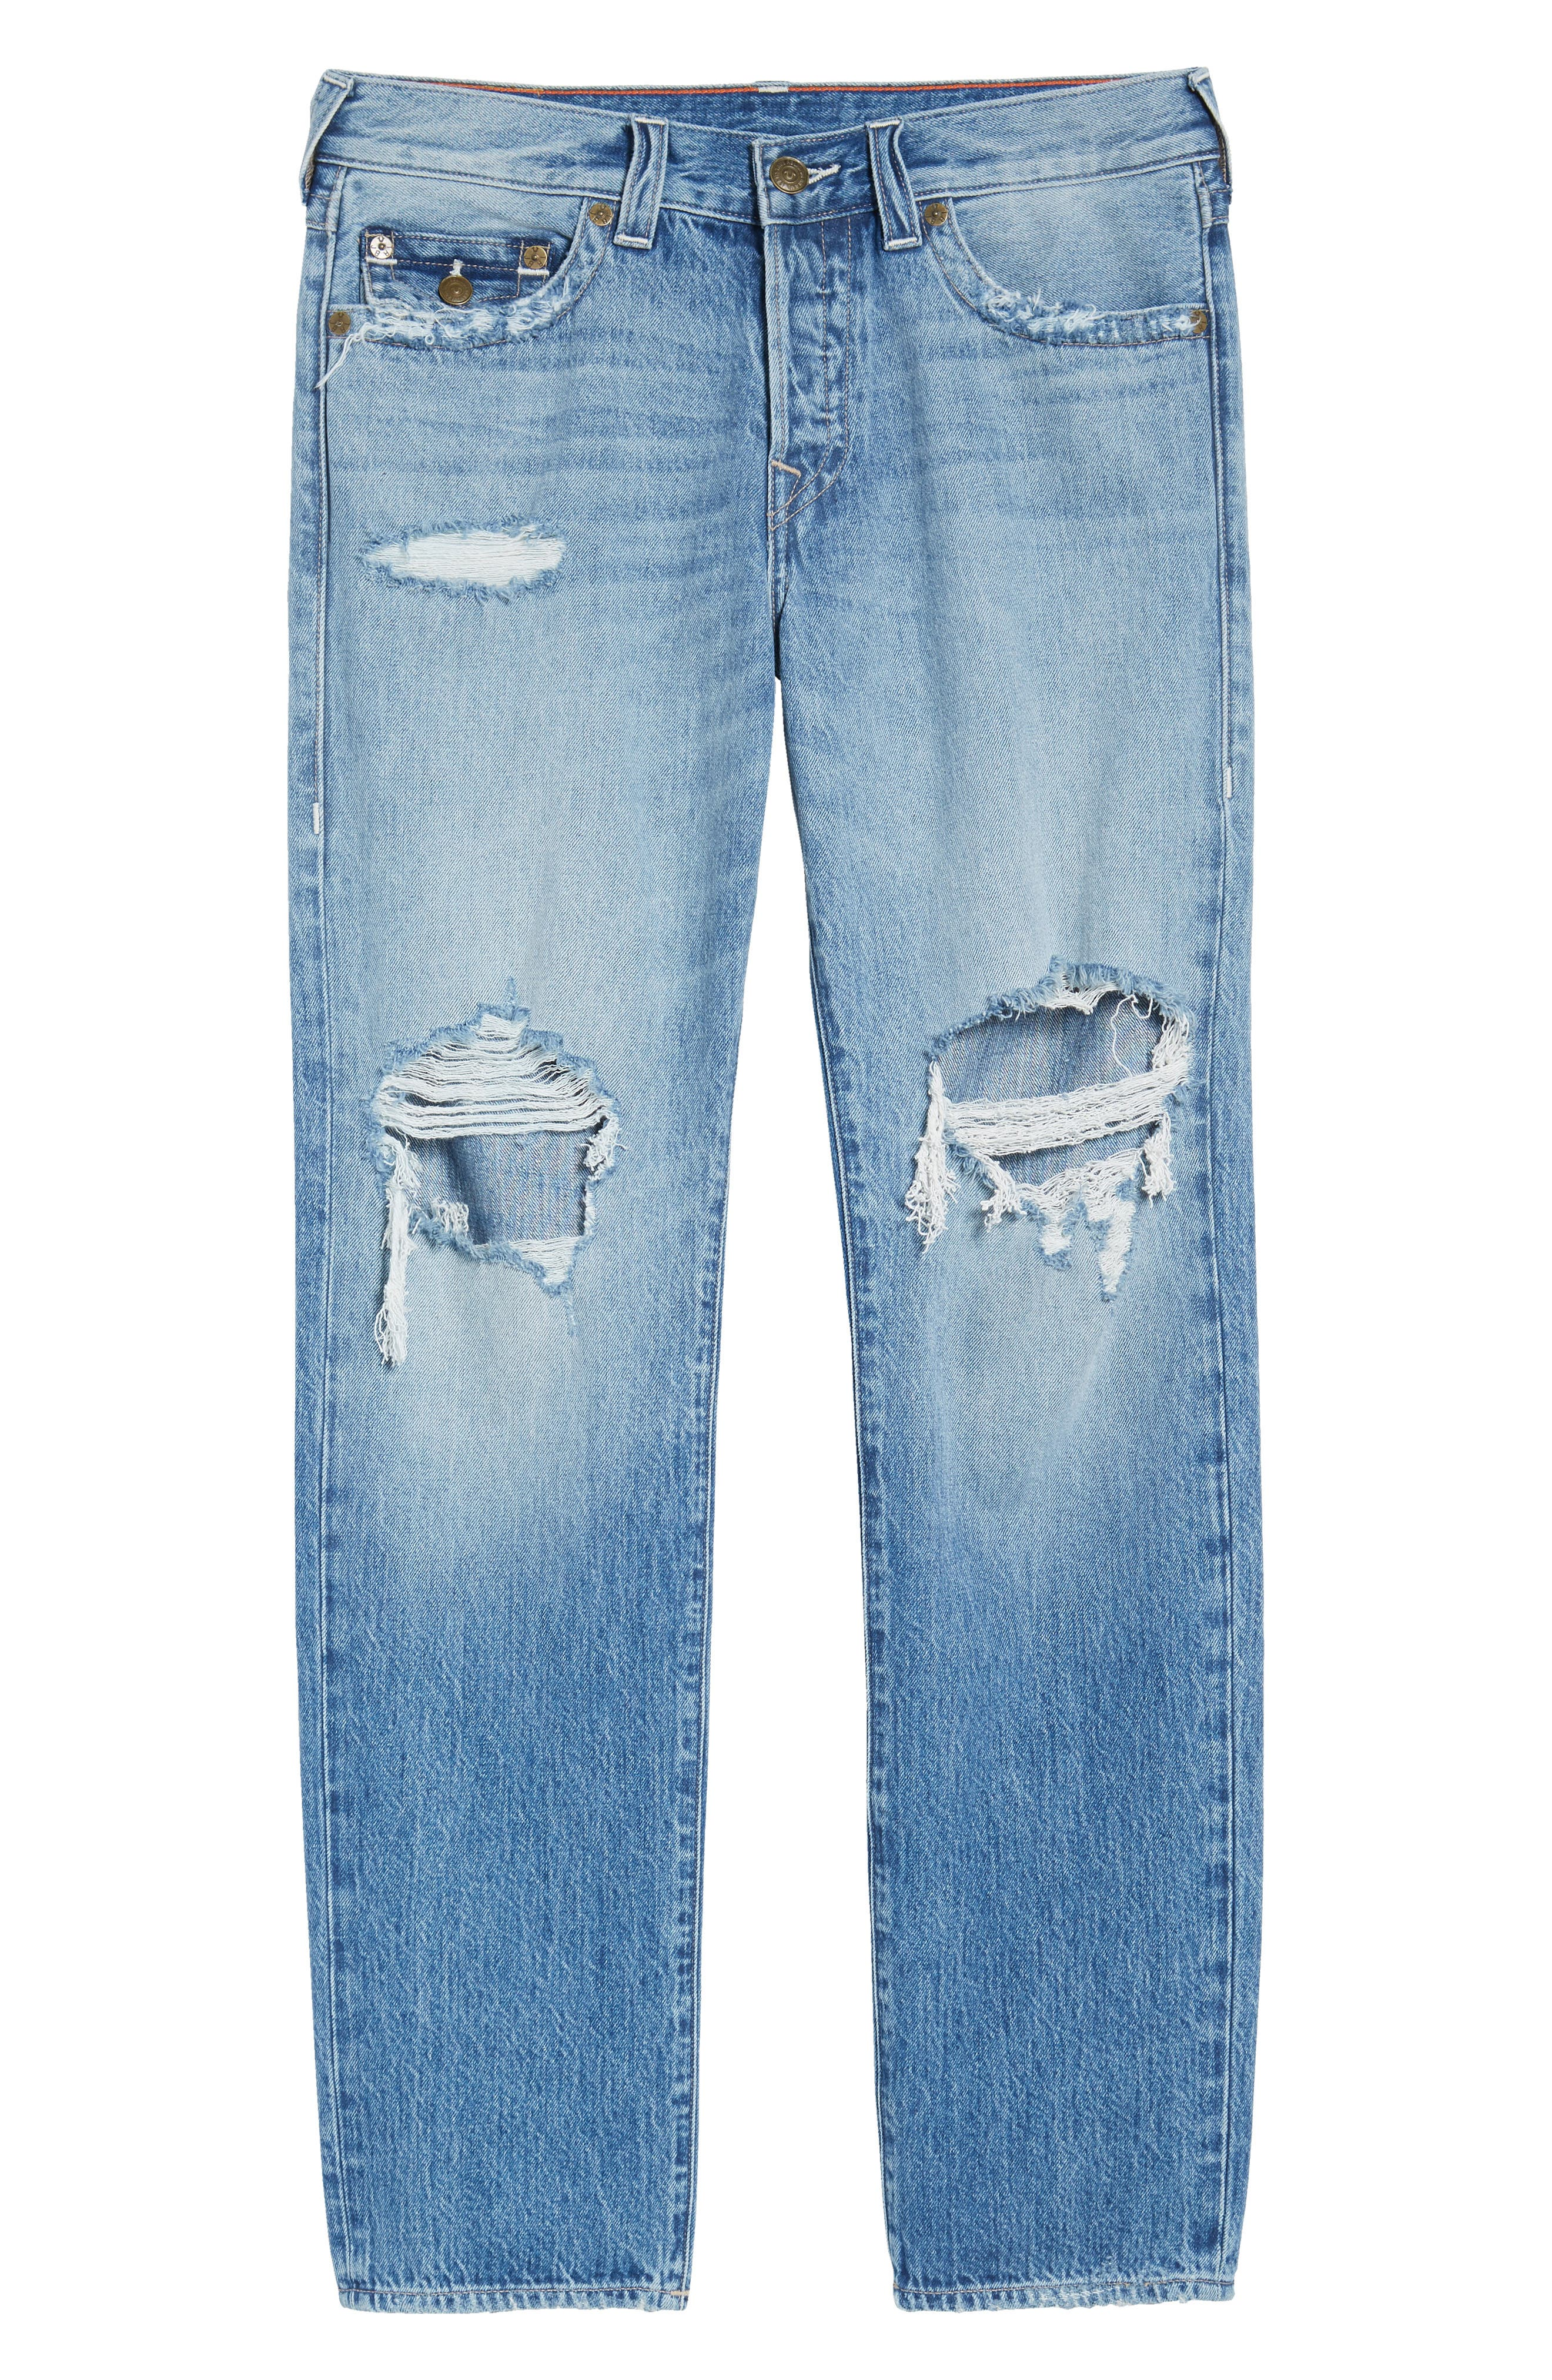 Geno Straight Leg Jeans,                             Alternate thumbnail 6, color,                             Eqnm Delinguent